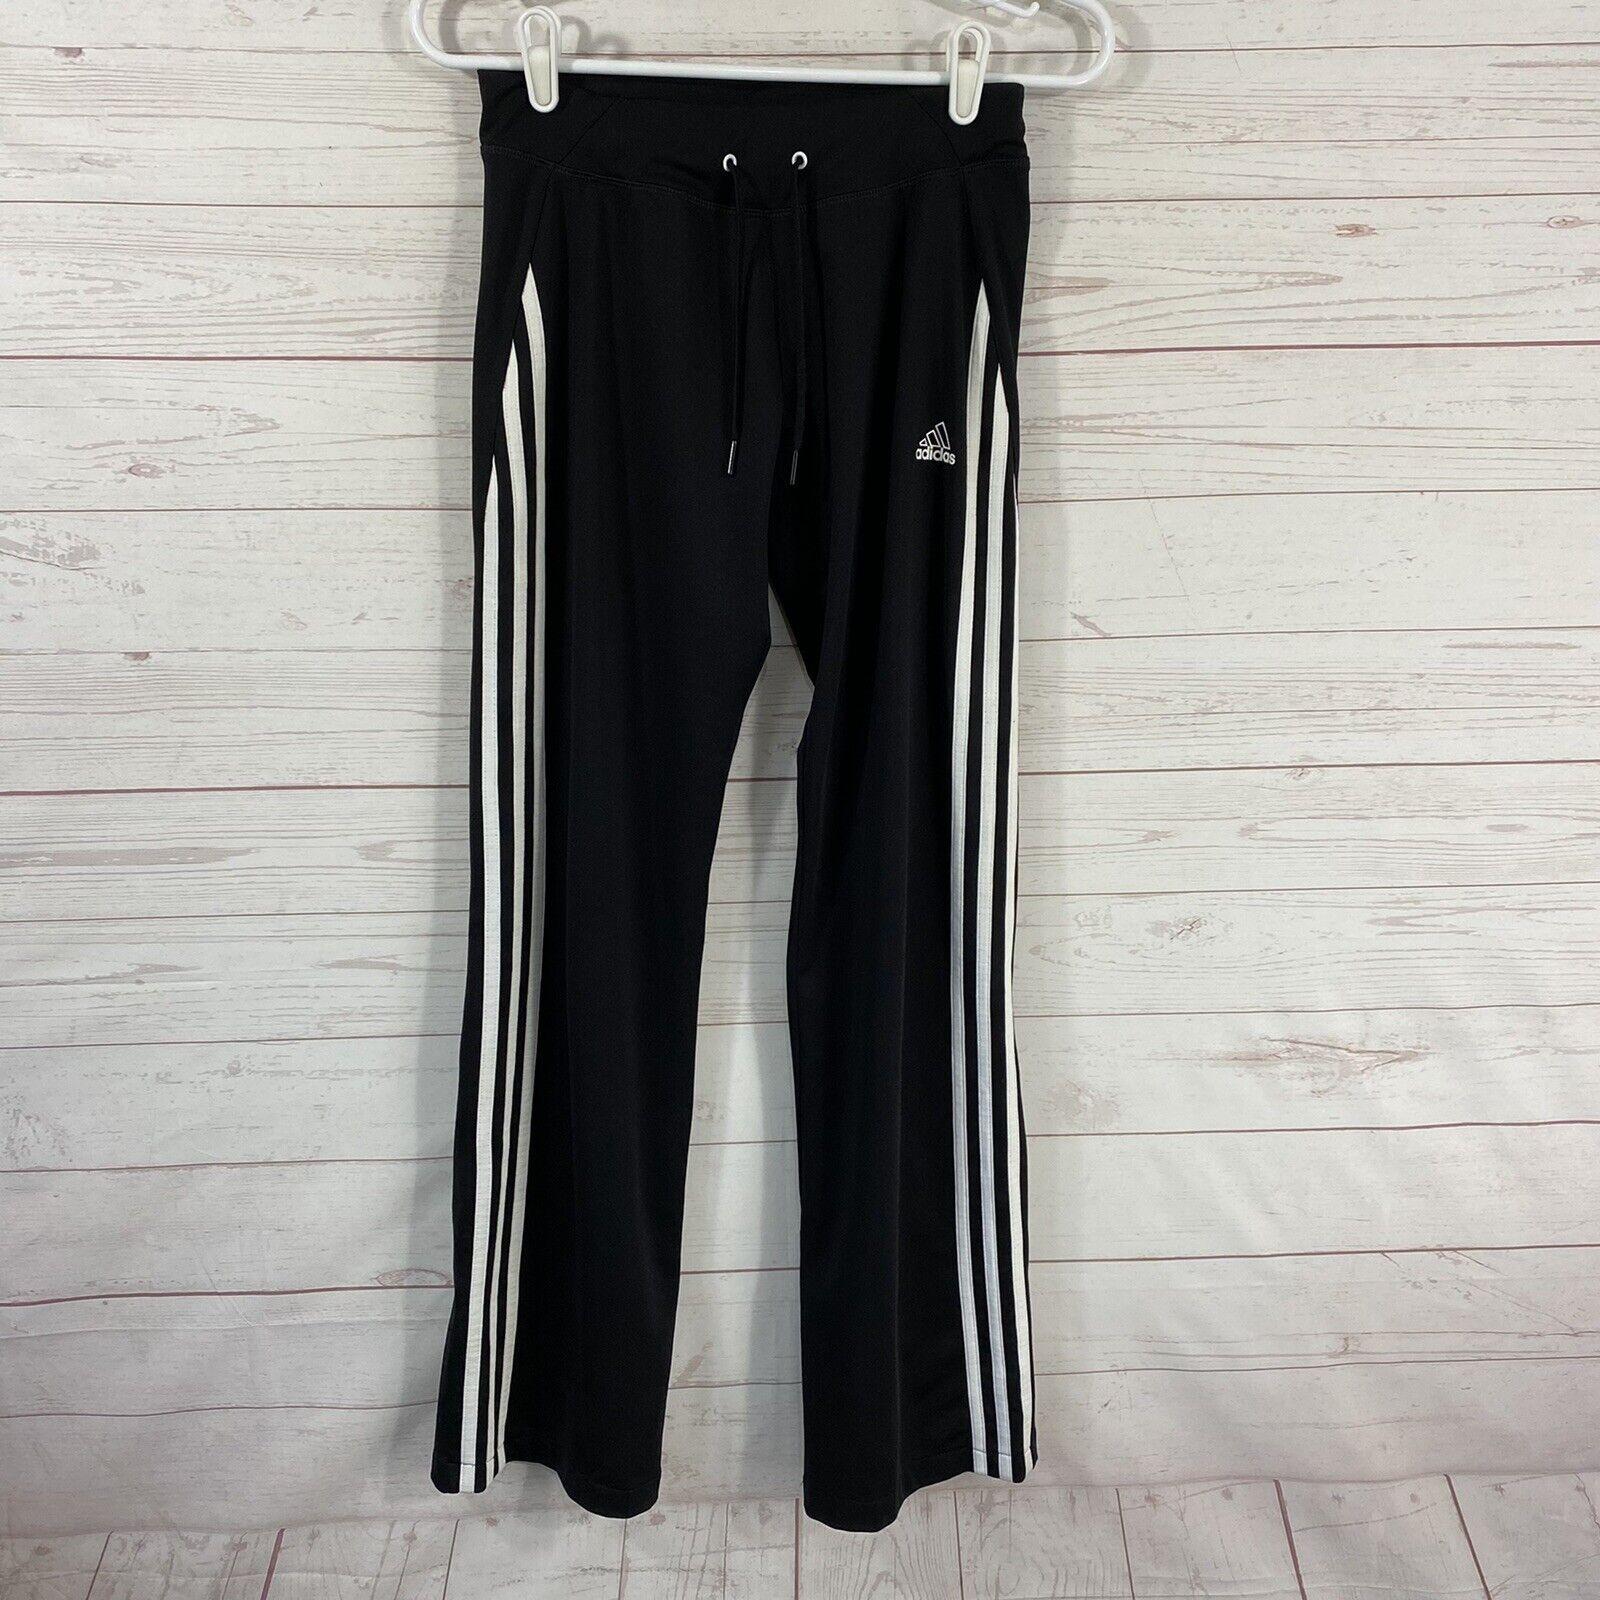 Adidas Womens Straight Leg 3-Stripe Sweatpants Size Small Black Drawstring 26x32